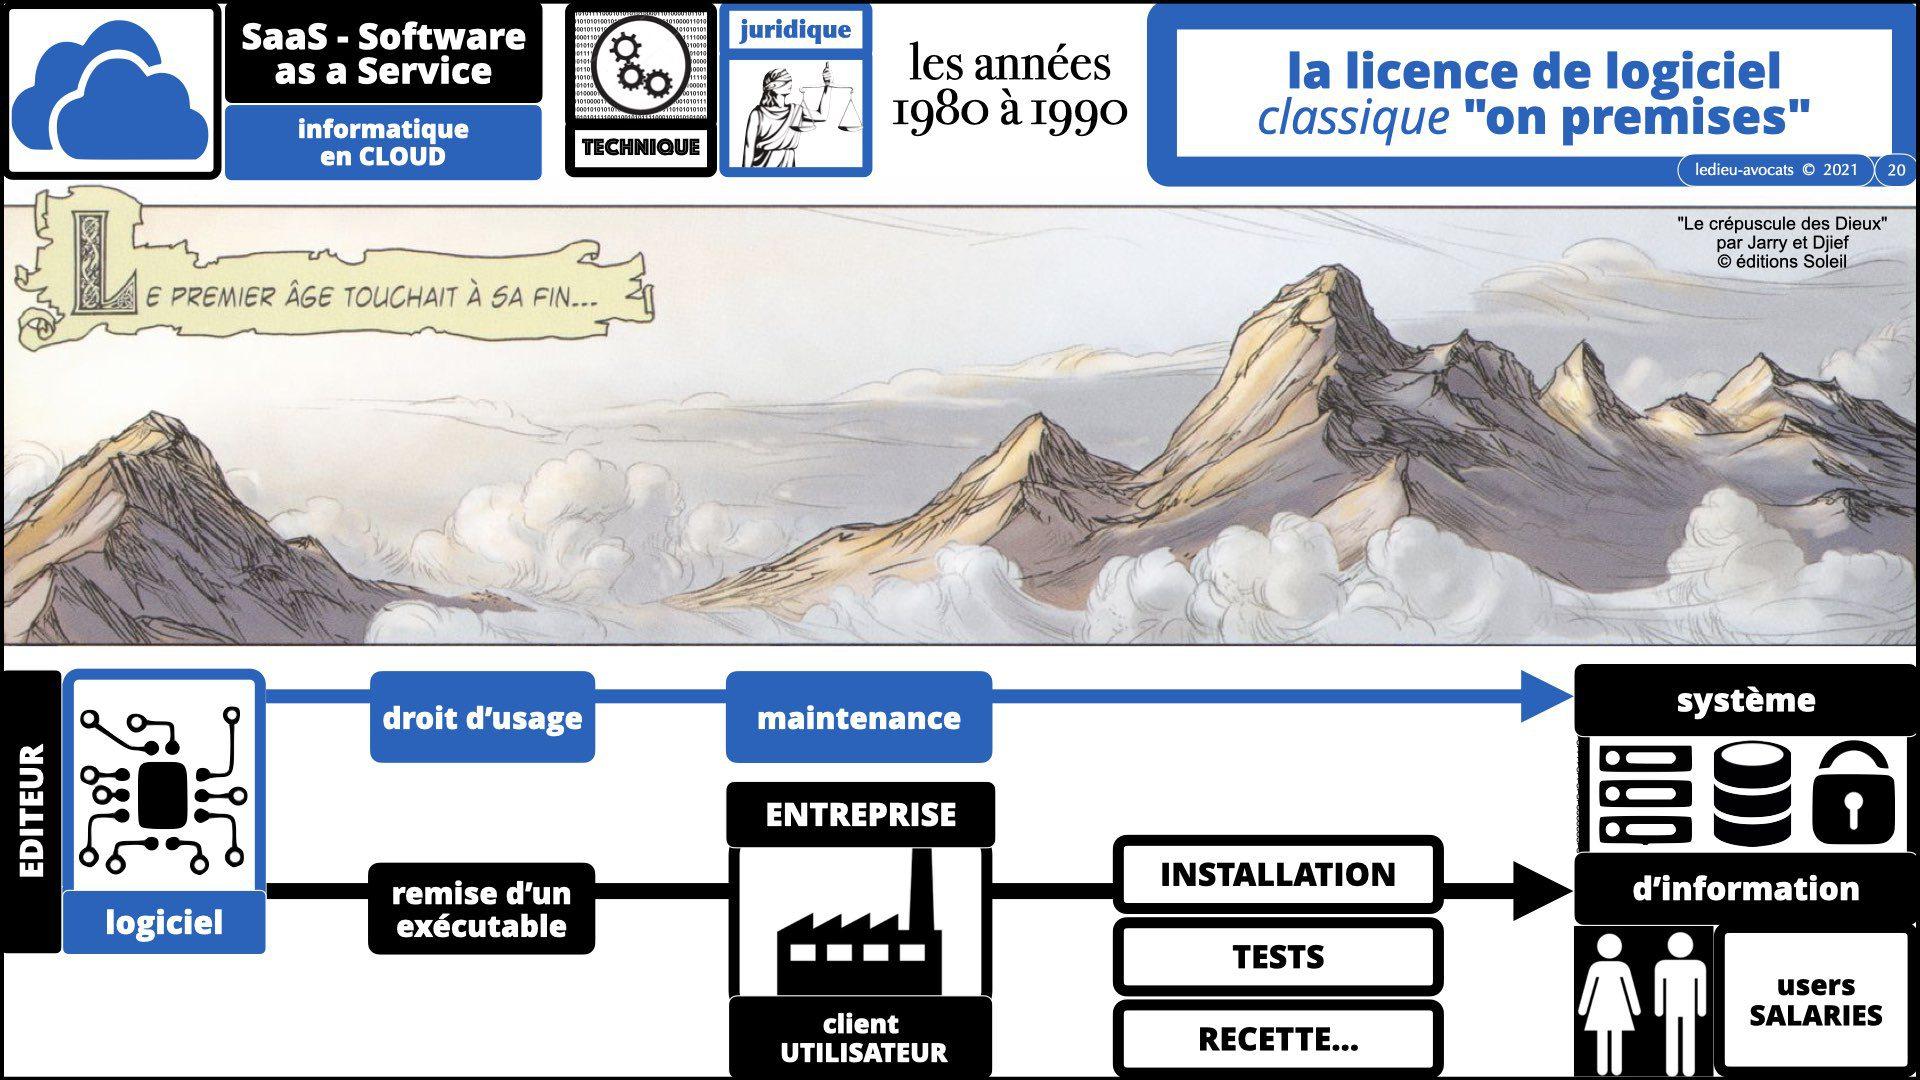 service logiciel SaaS 2021 : la licence de logiciel